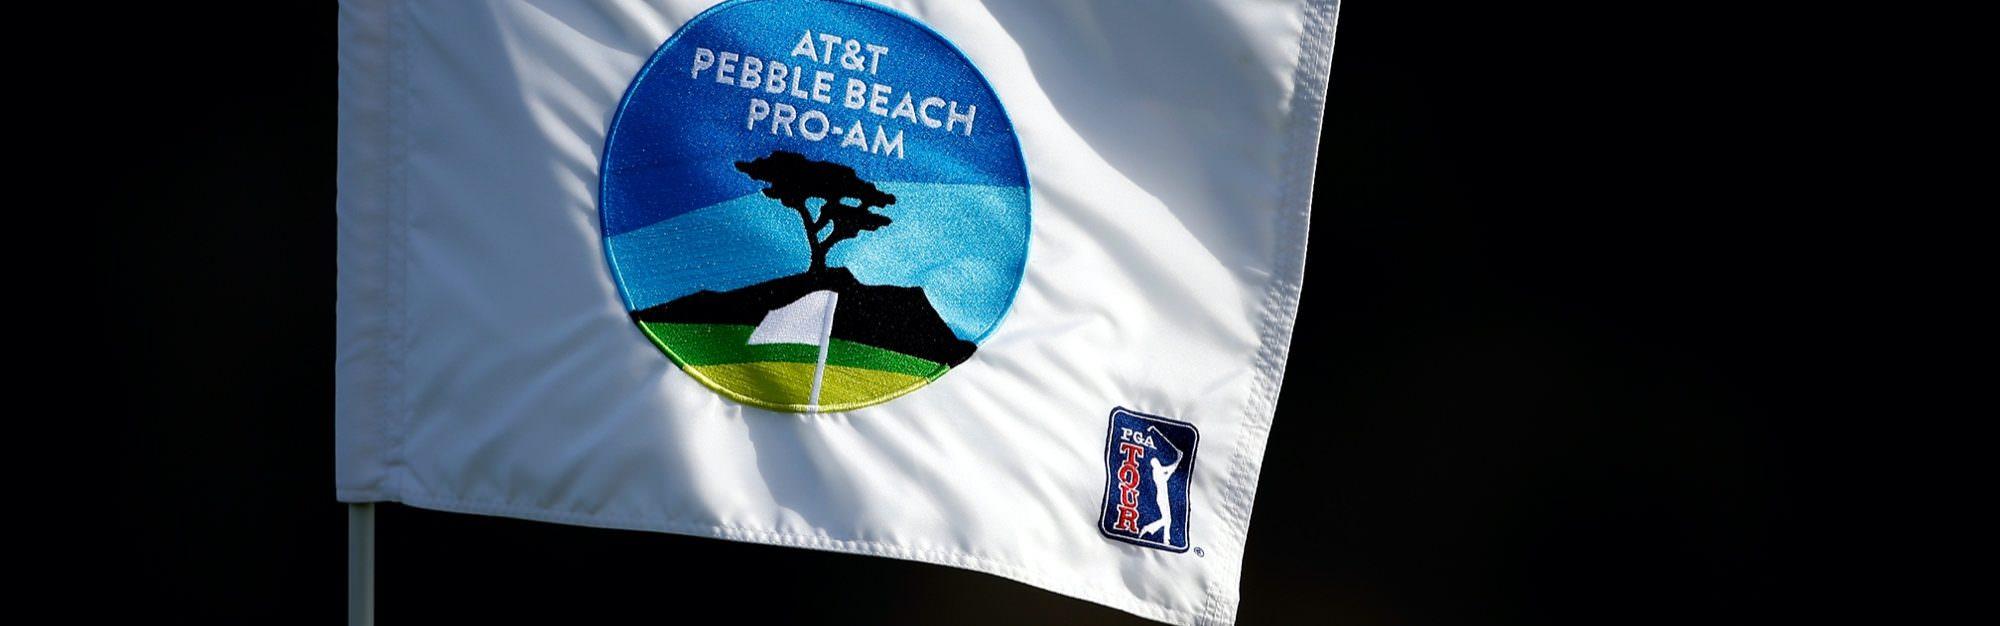 Pebble Beach Pro-Am prize money